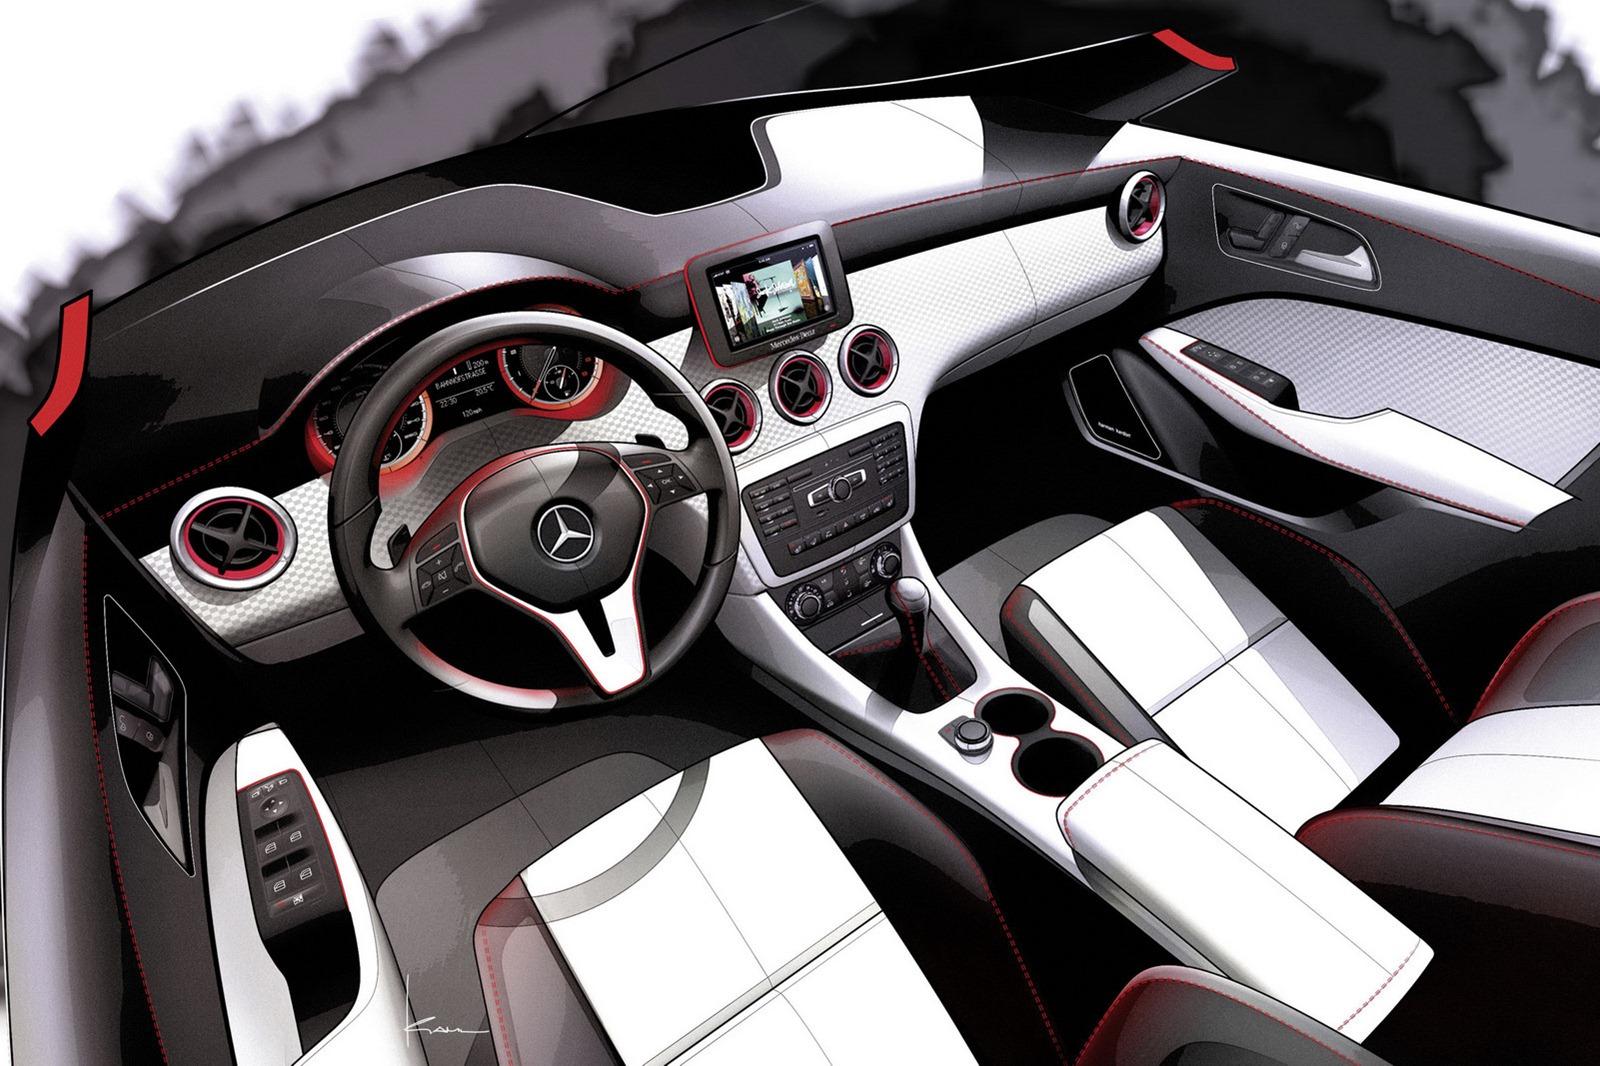 2012 Mercedes Benz A-Class New Photos Released - autoevolution